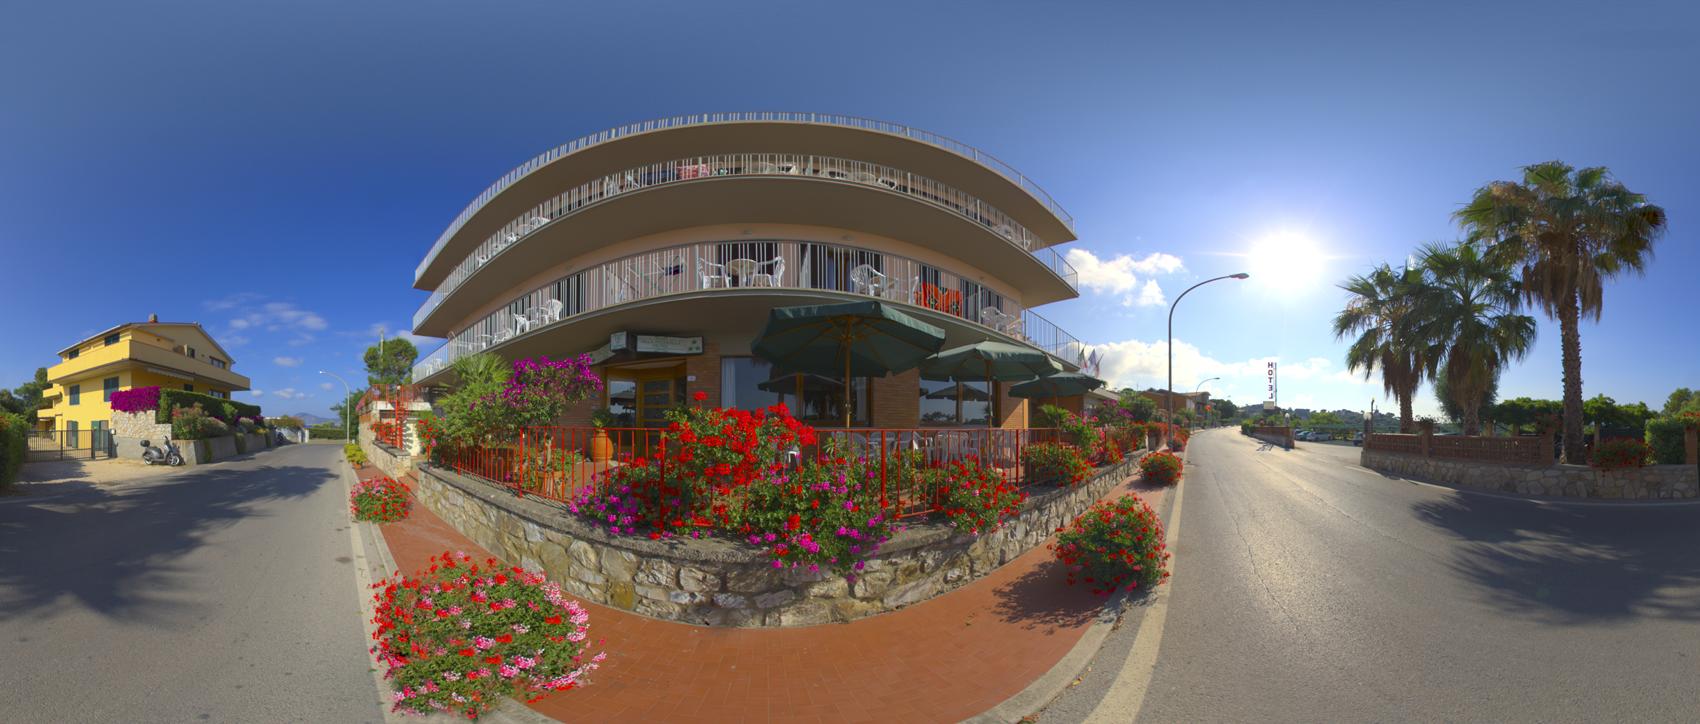 Hotel Paduella